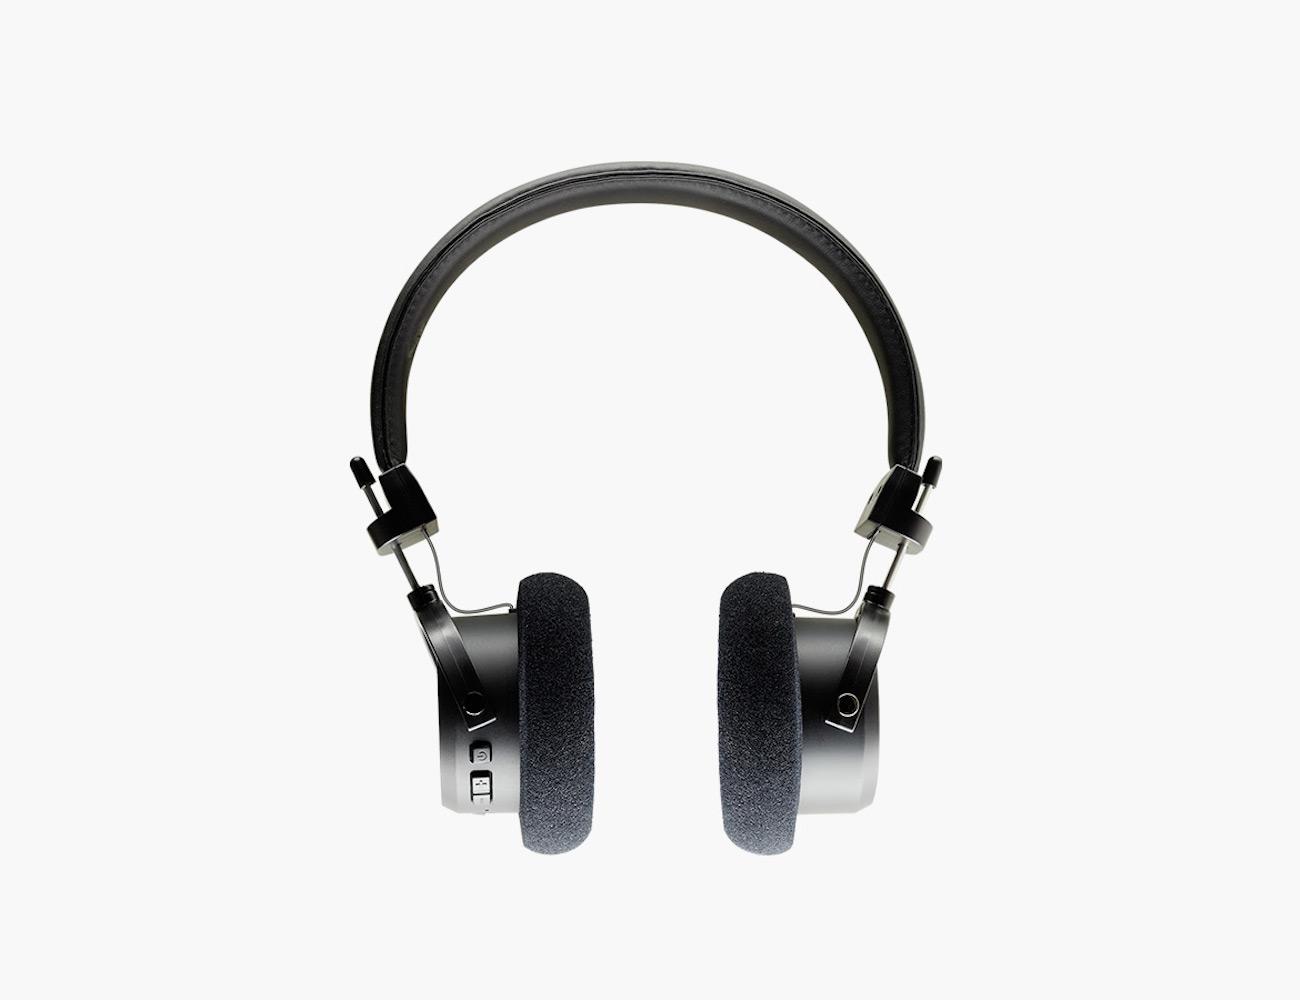 Grado Labs GW100 Bluetooth Open-Back Headphones